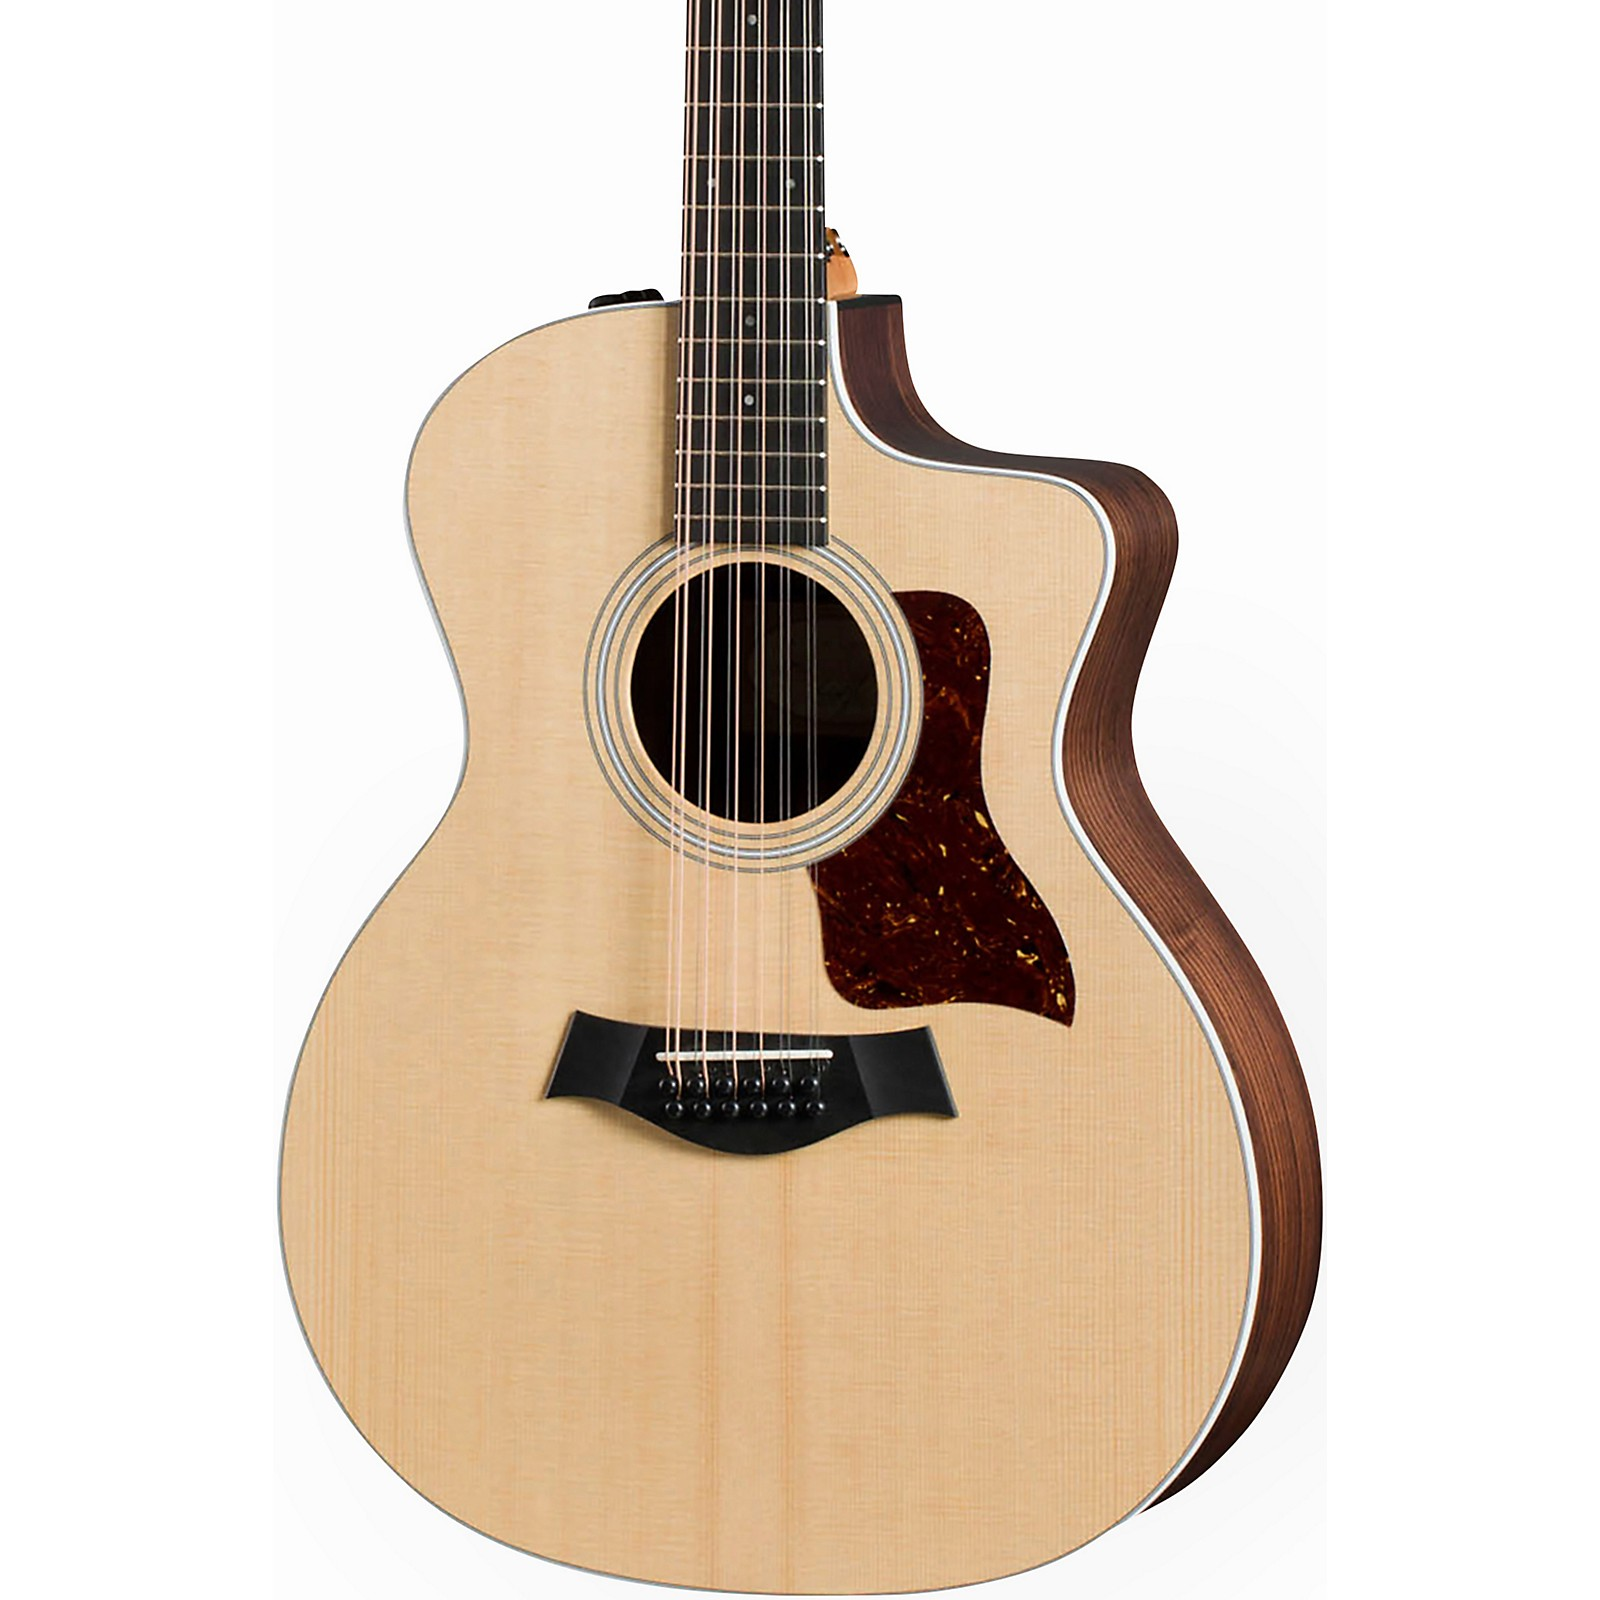 Taylor 254ce Grand Auditorium 12-String Acoustic-Electric Guitar